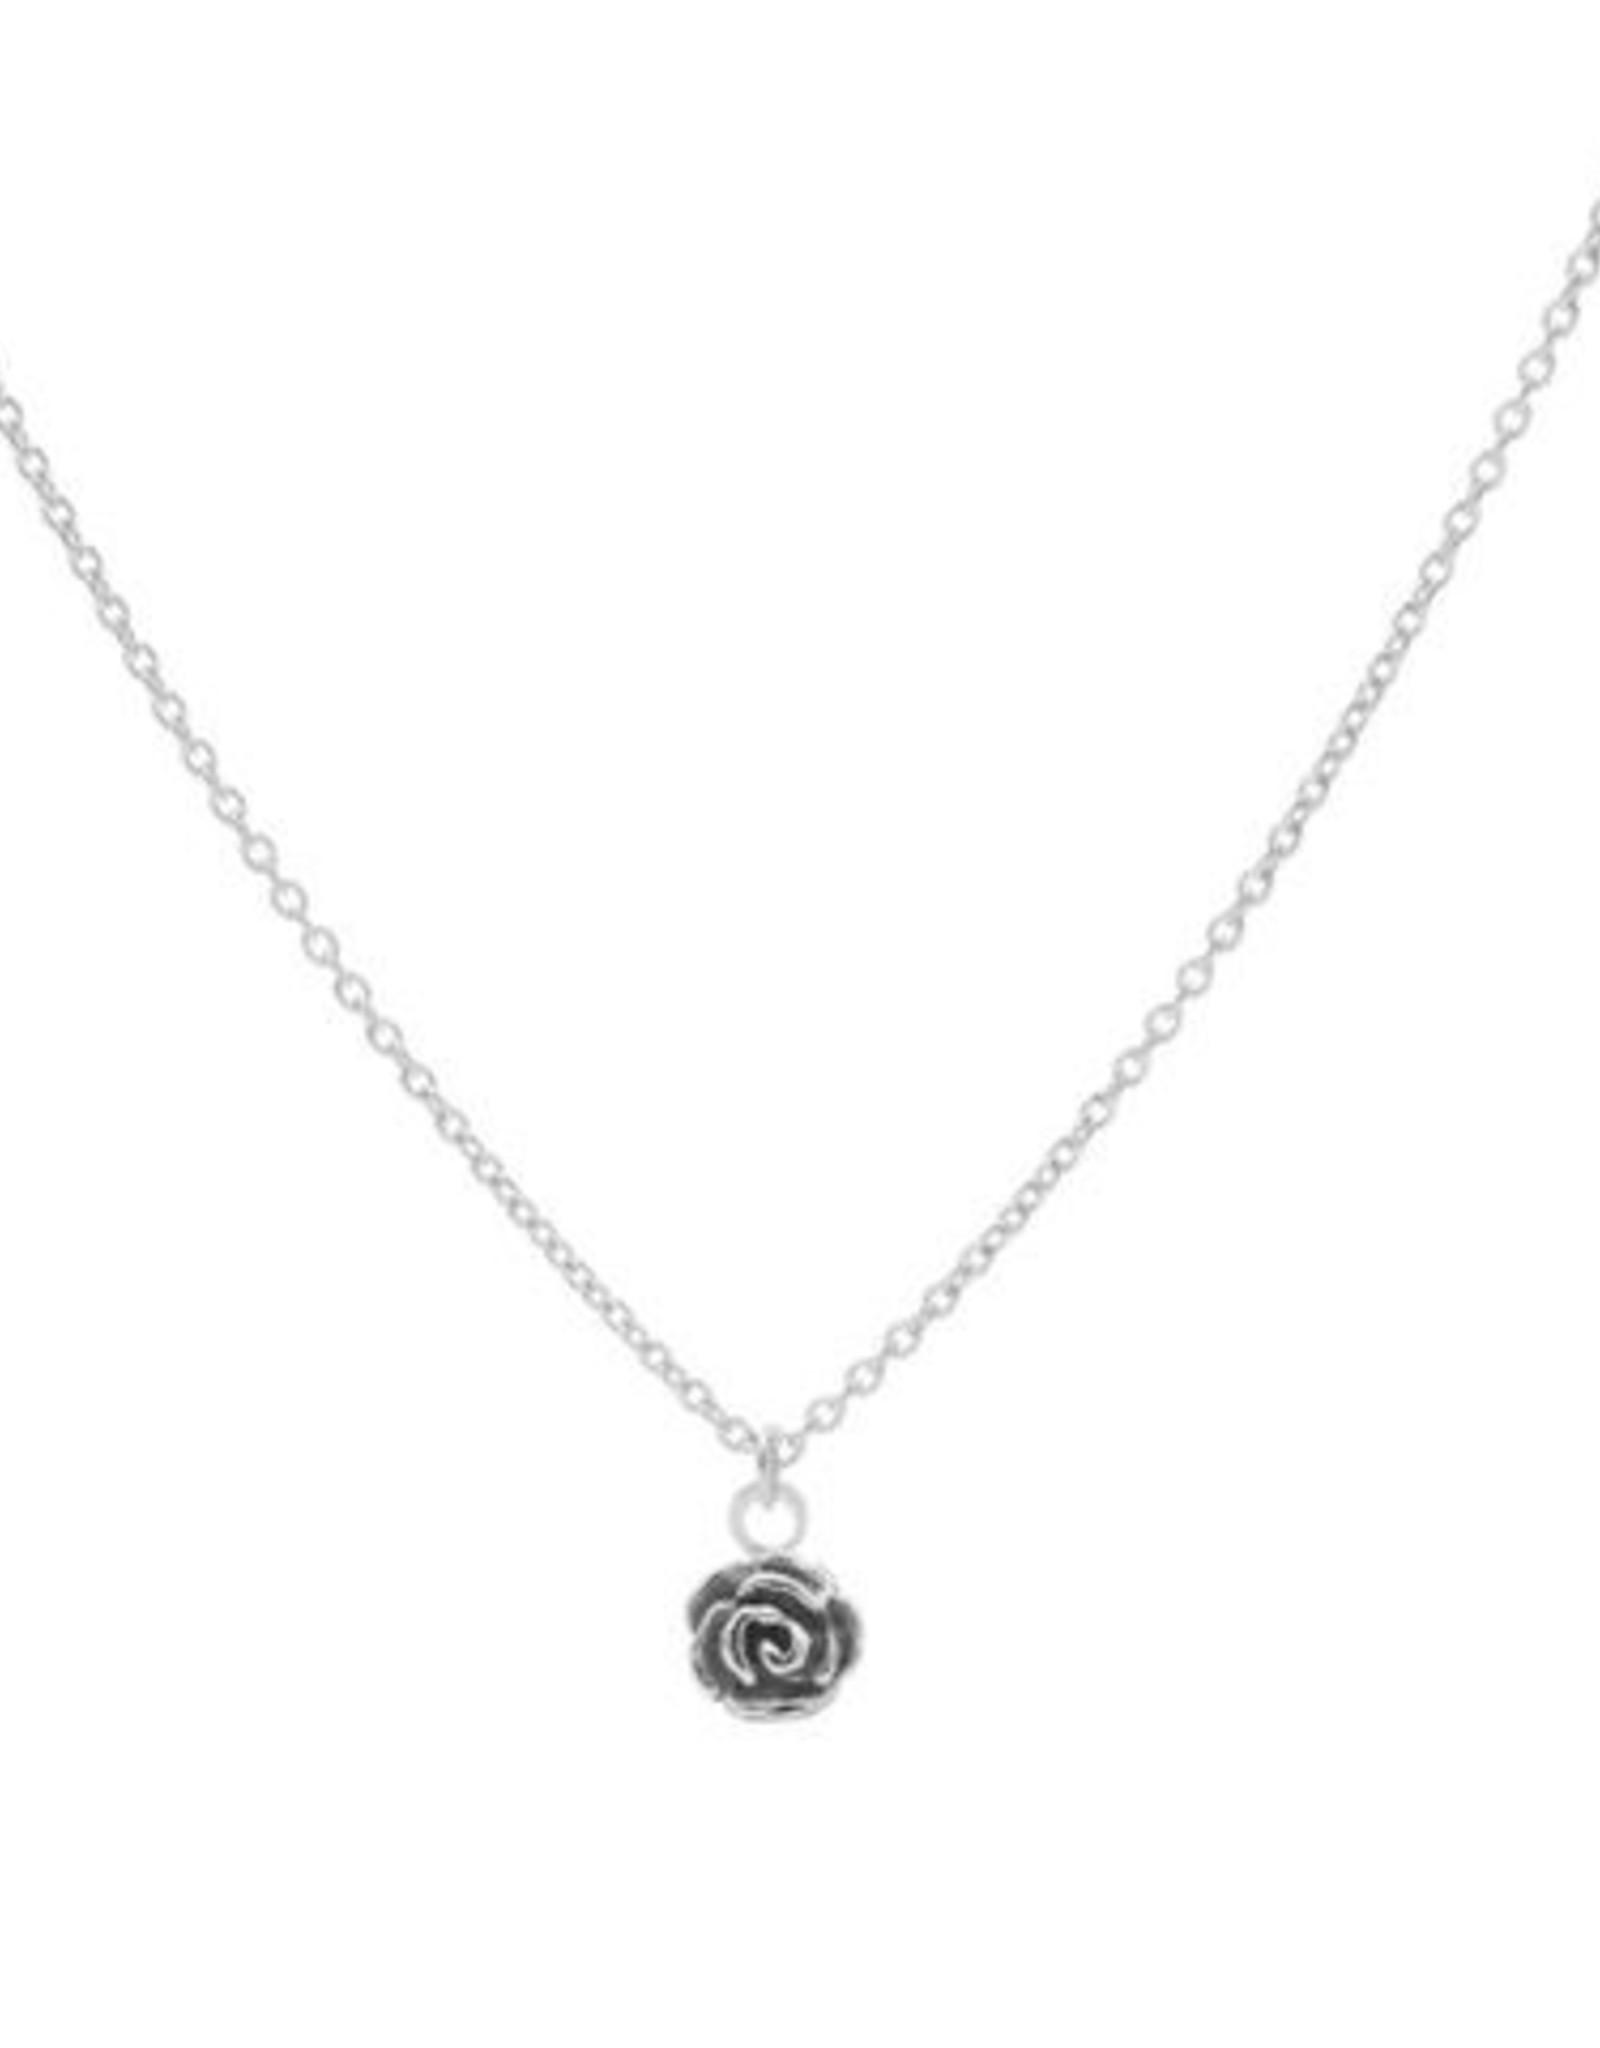 Karma Necklace Flower Rose Silver